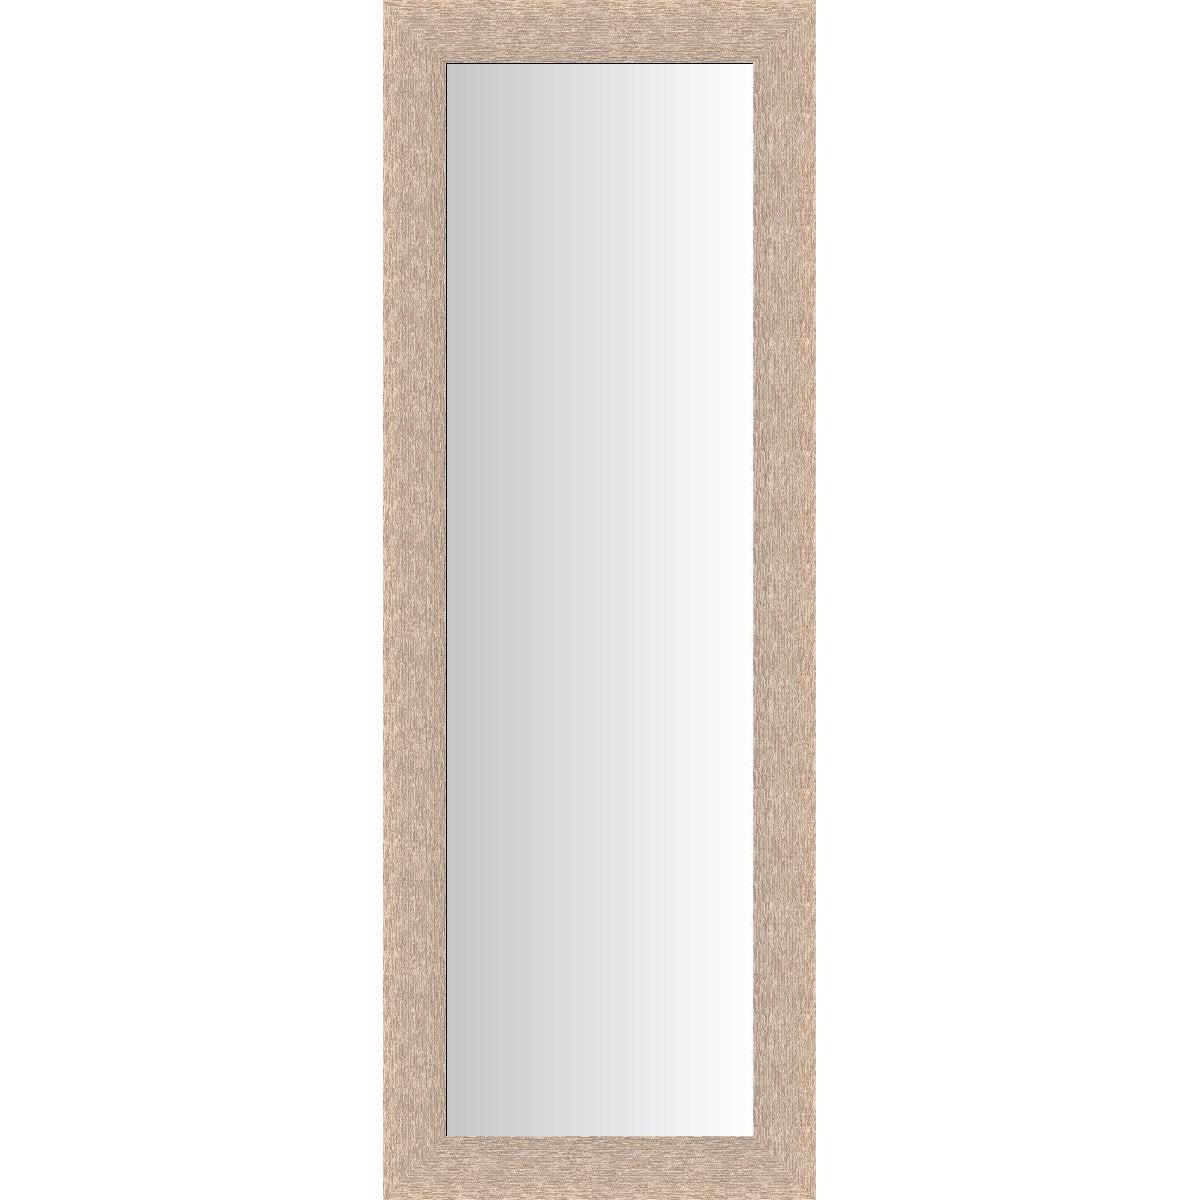 Miroir Dublin chªne clair 40x140 cm